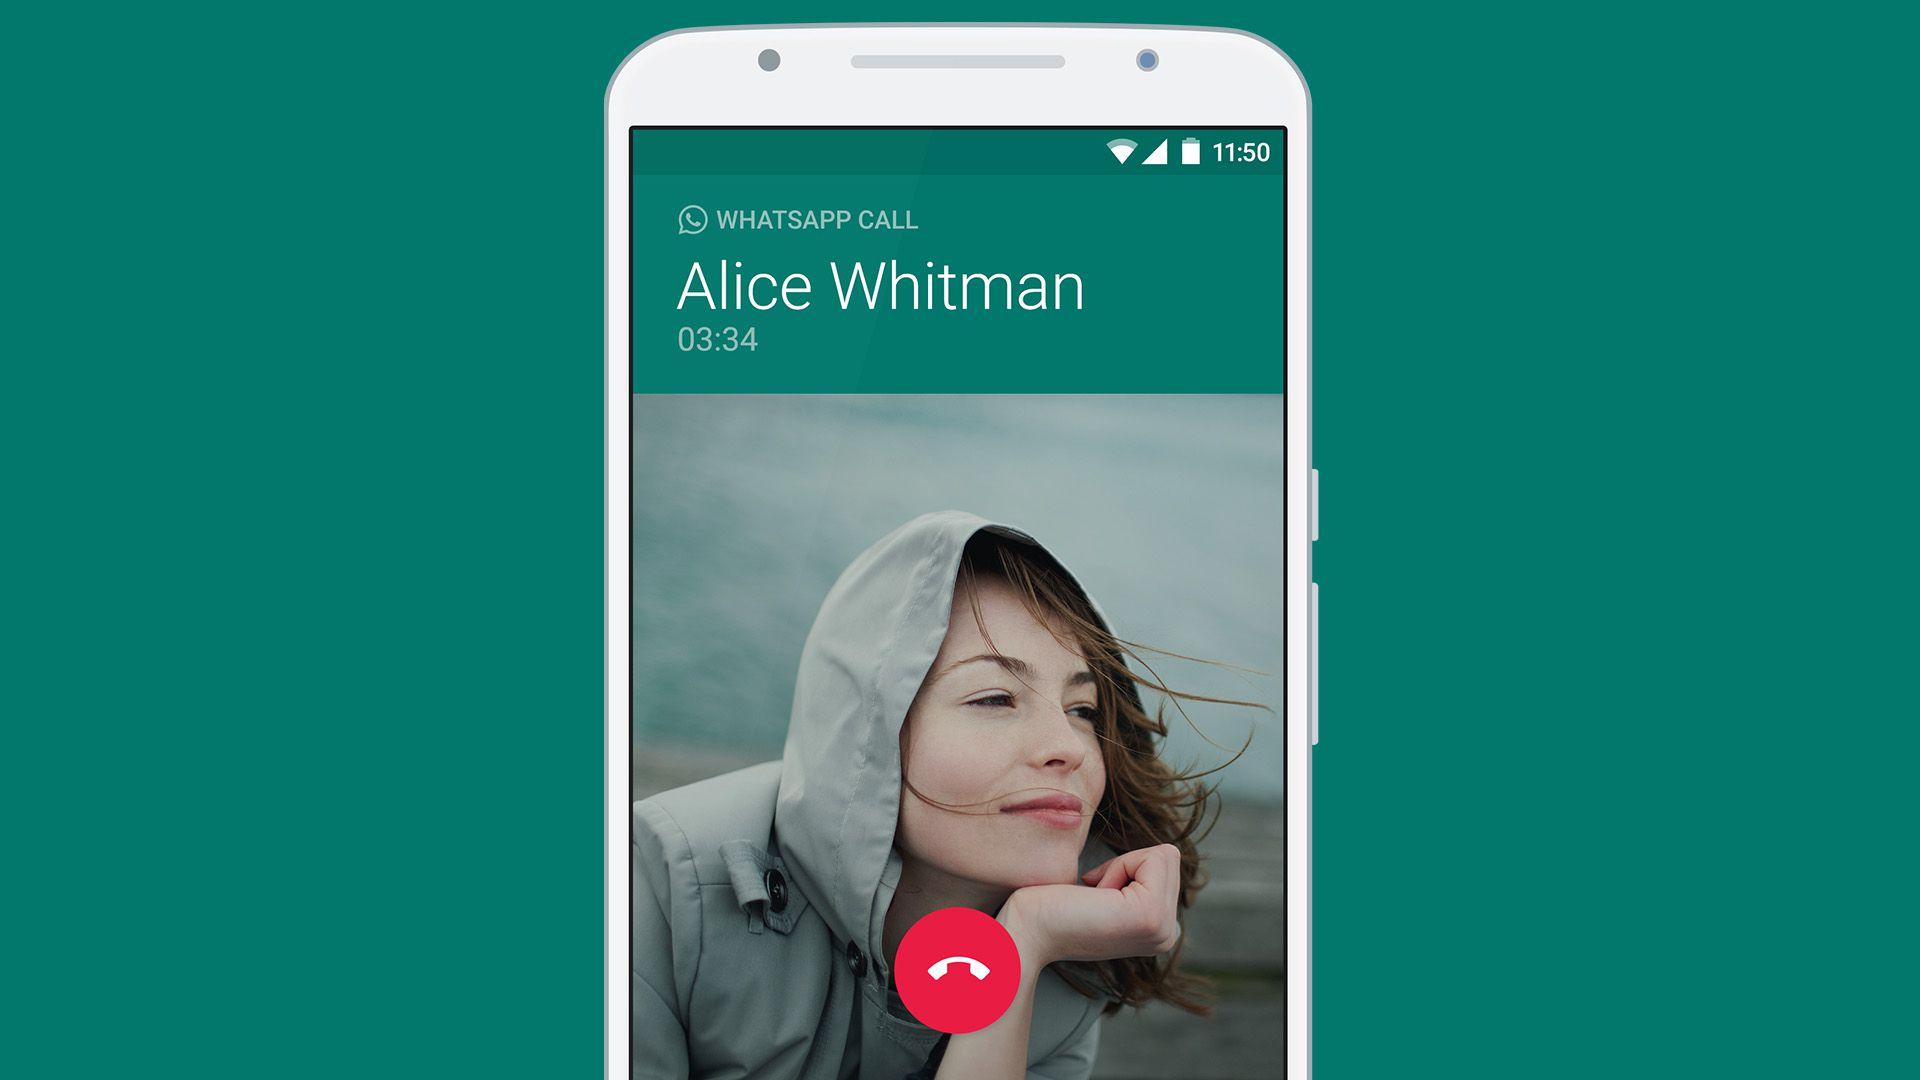 WhatsApp incoming voice call screen